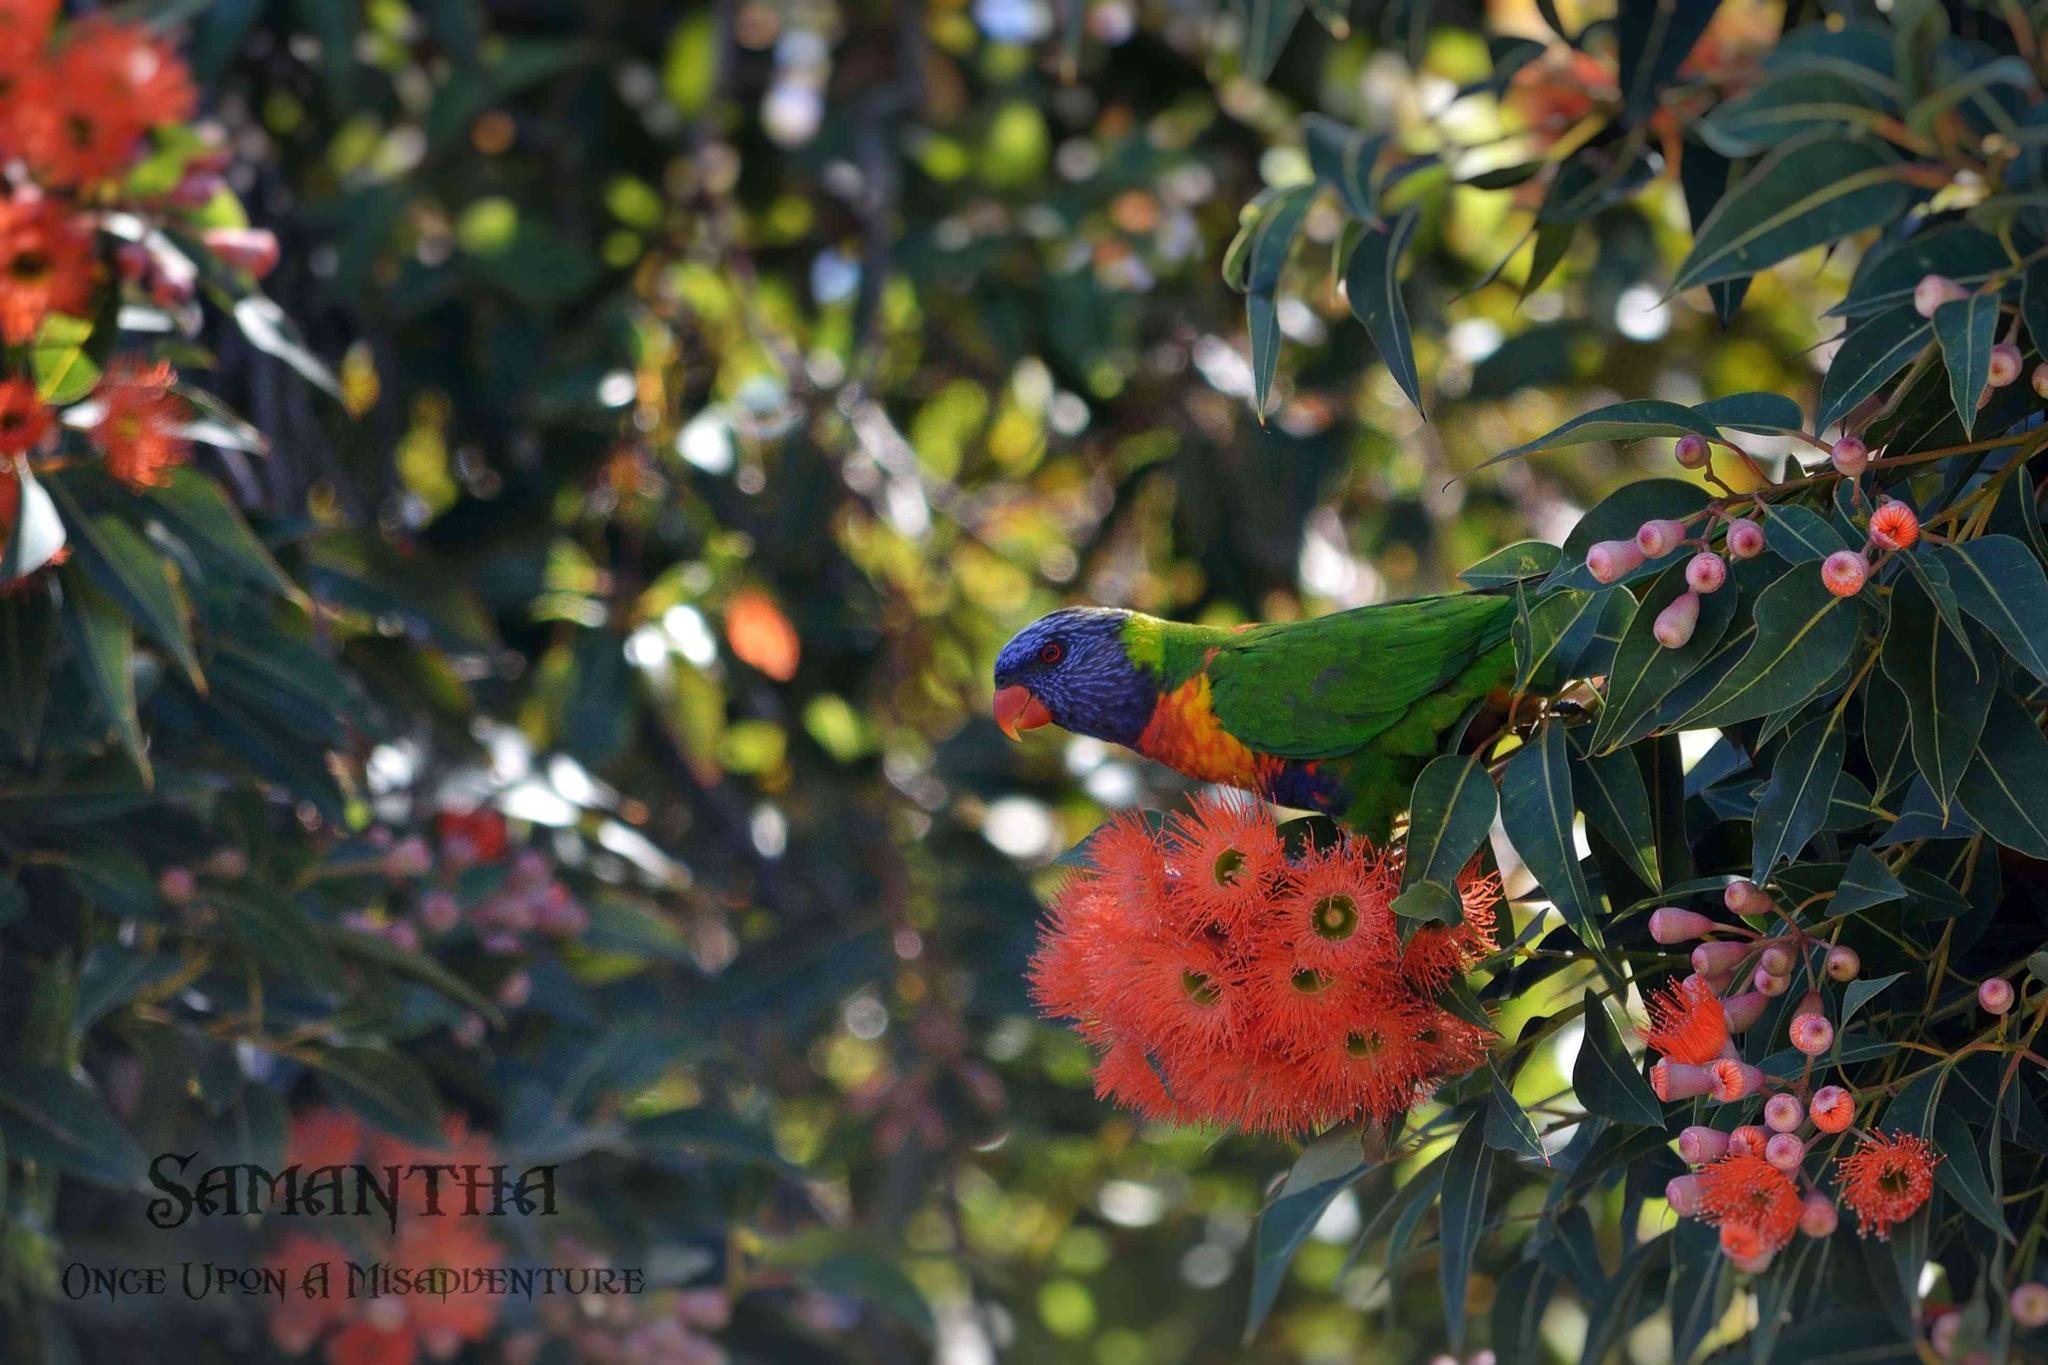 Illawarra Flame Tree & Rainbow Lorikeet by Samantha Cullen